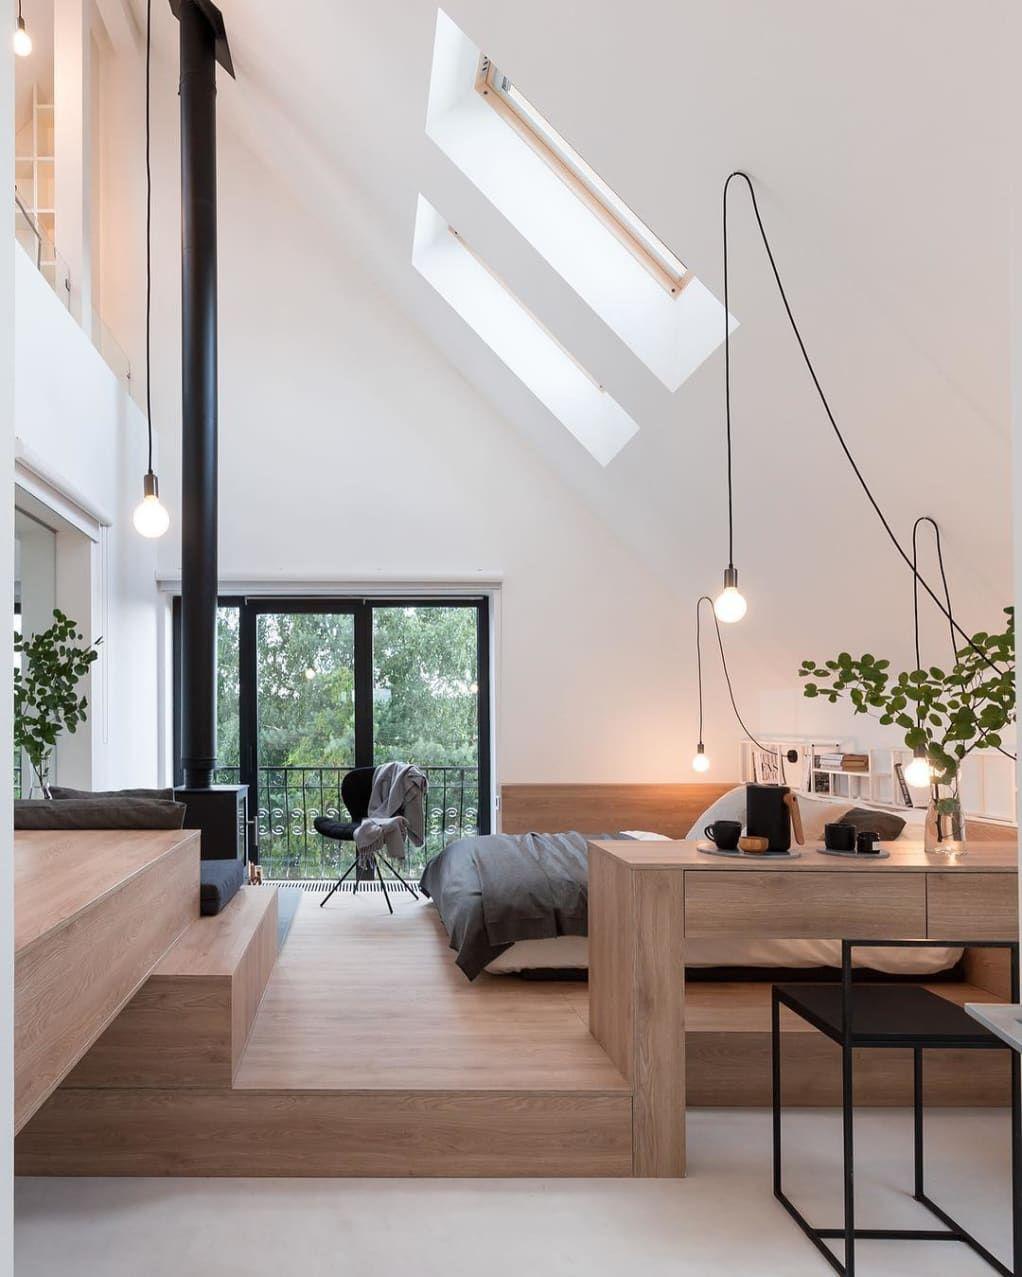 Minimal interior design inspiration ultralinx also marvelous useful ideas transitional lighting round tables rh pinterest